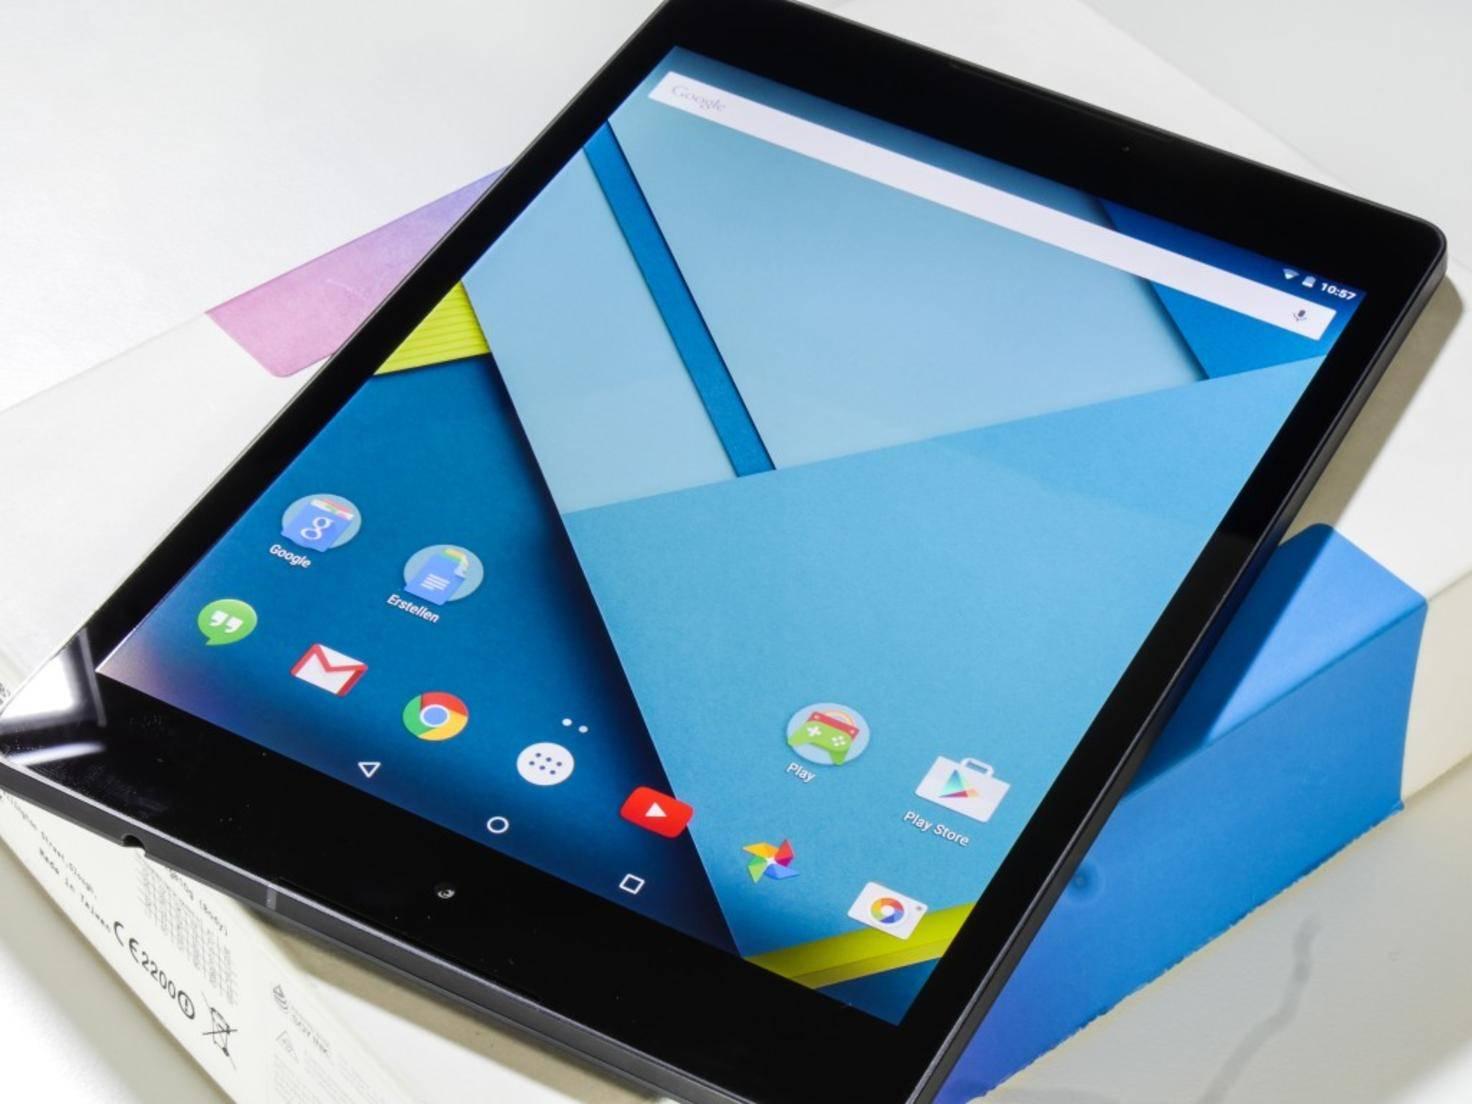 Google Nexus 9 Display